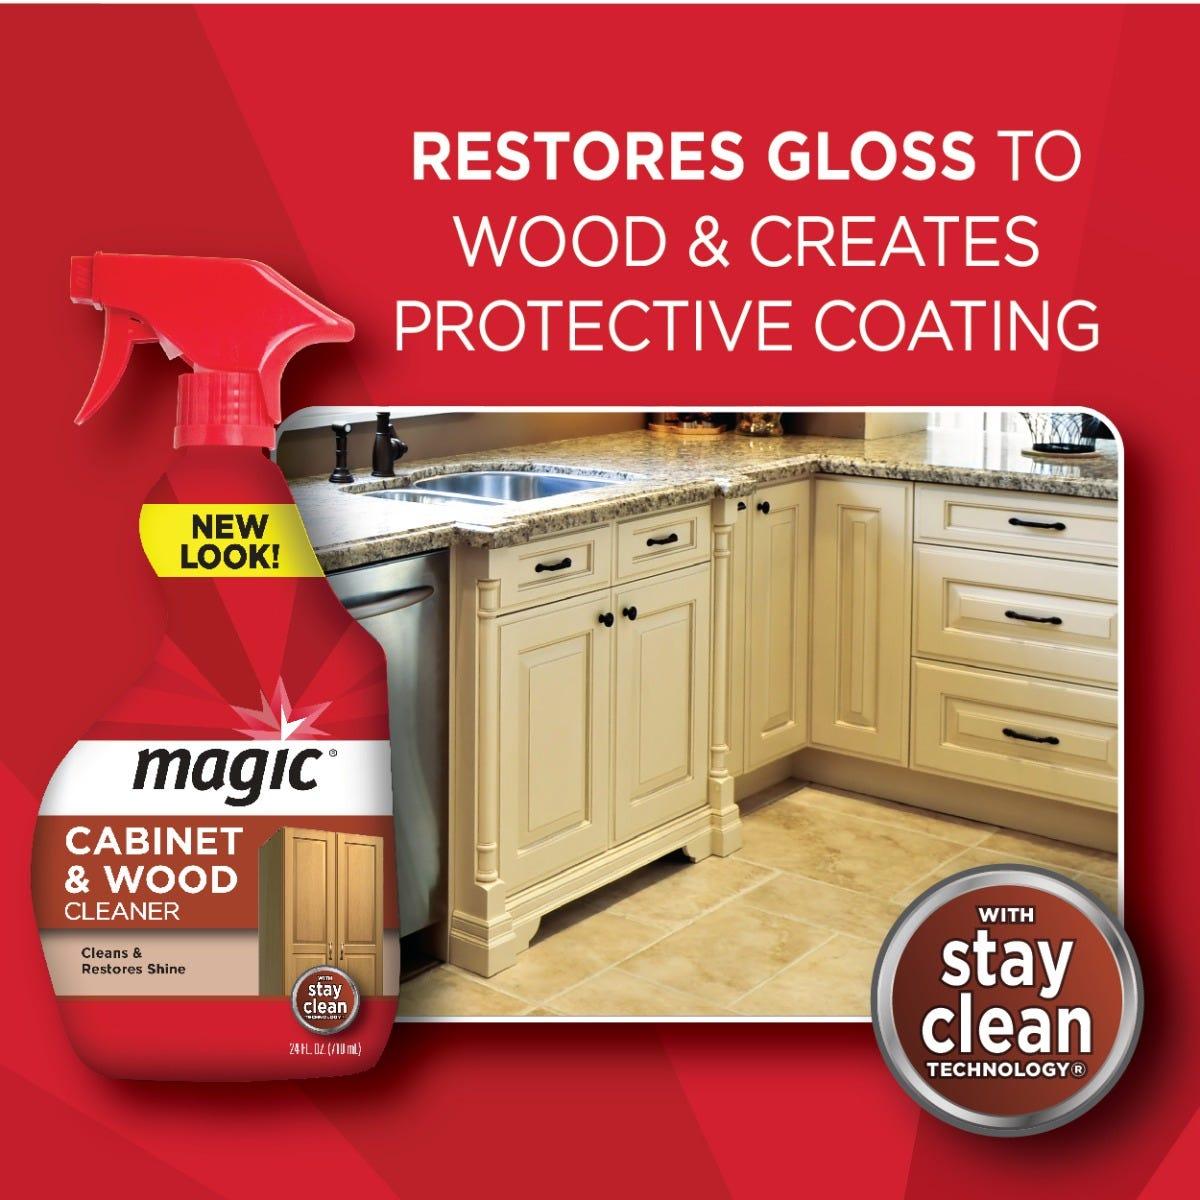 https://googone.com/media/catalog/product/m/a/magic_cabinet_cleaner_spray_beauty_2.jpg